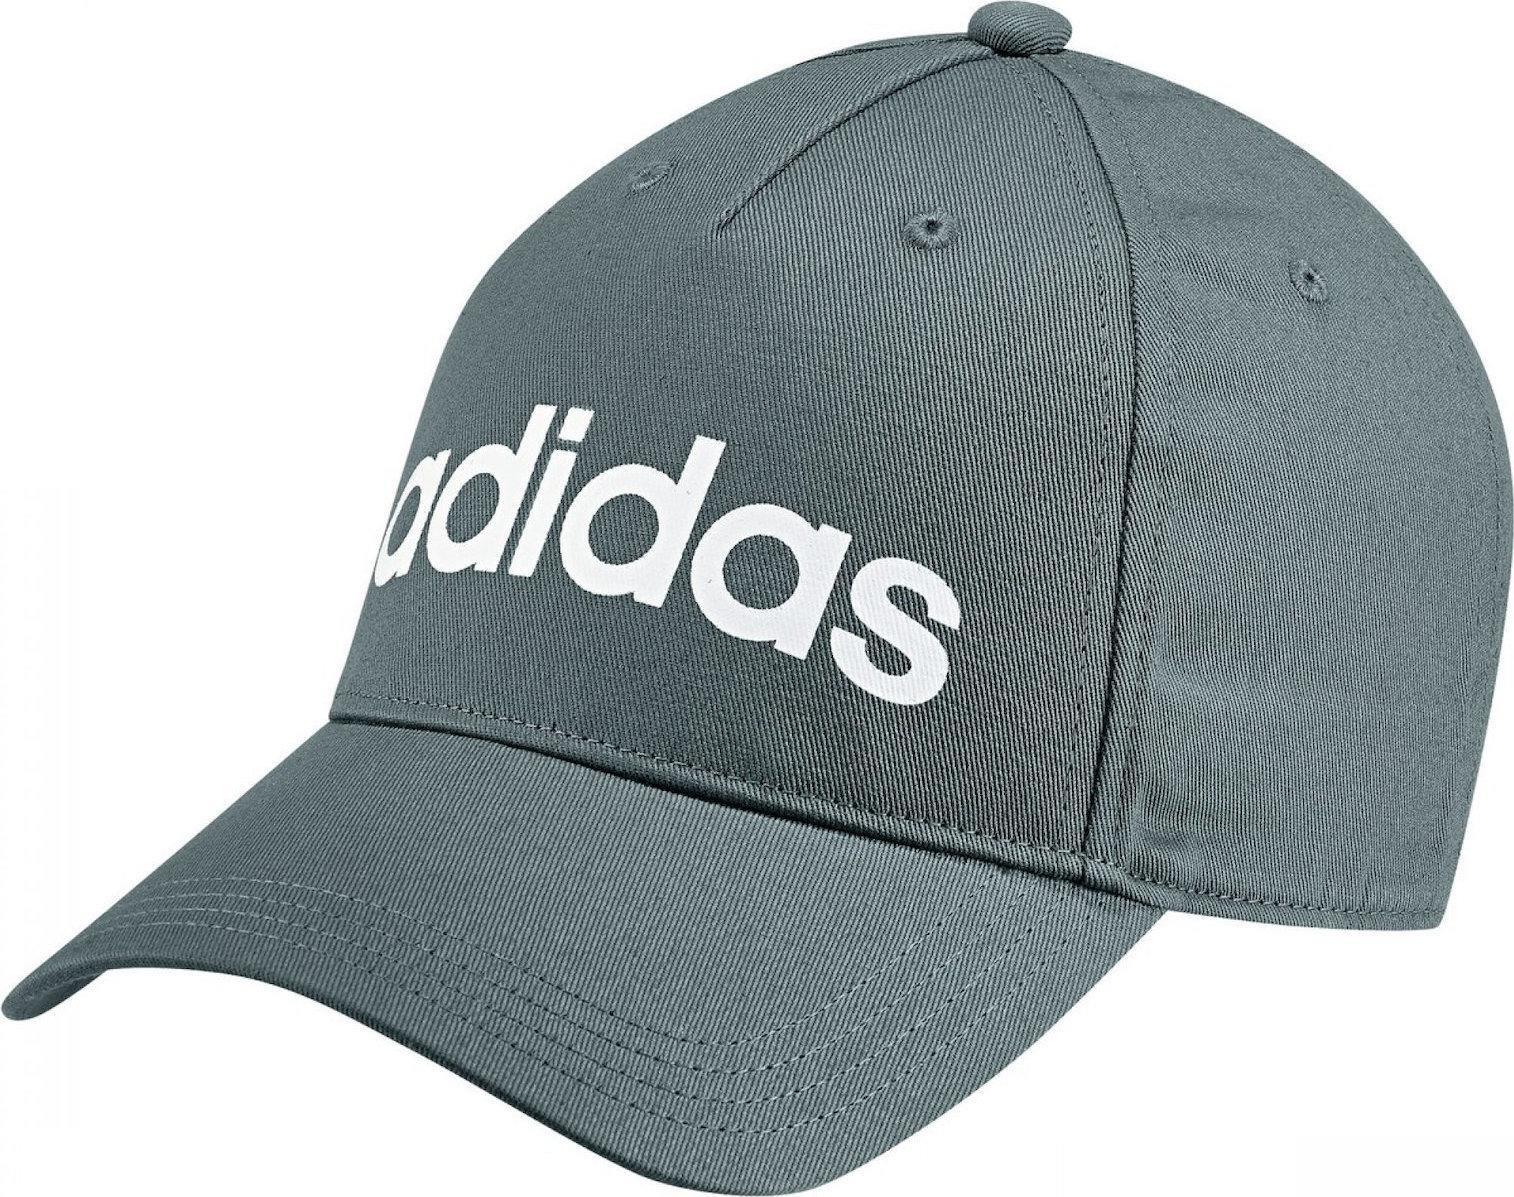 Adidas Daily Cap DM6180 - Skroutz.gr ac7107280a9